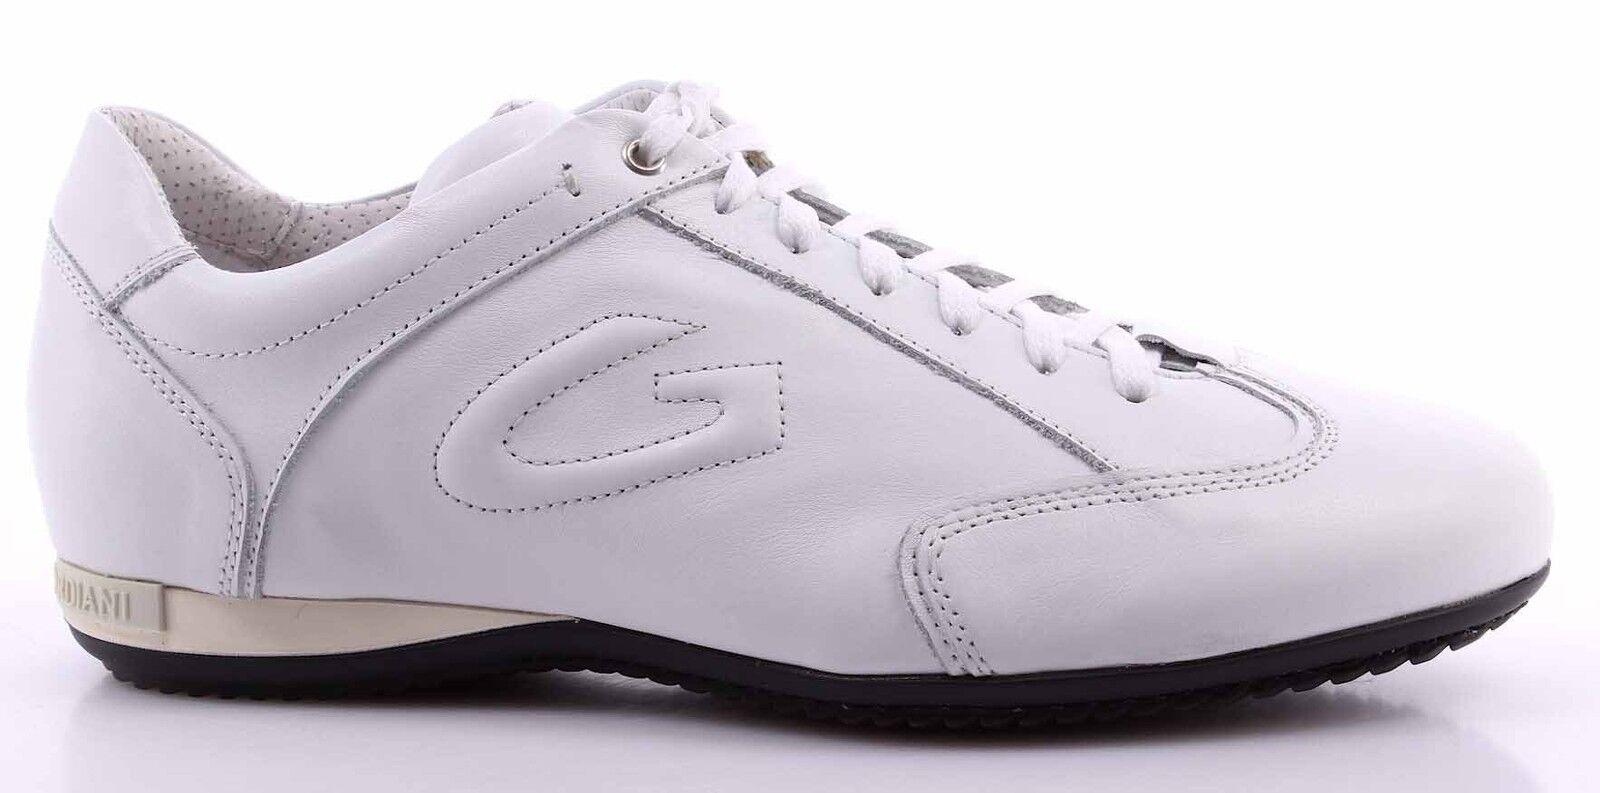 Scarpe Scarpe da Ginnastica Uomo ALBERTO GUARDIANI Sport Man Shoes Adler Bianche Pelle Italy